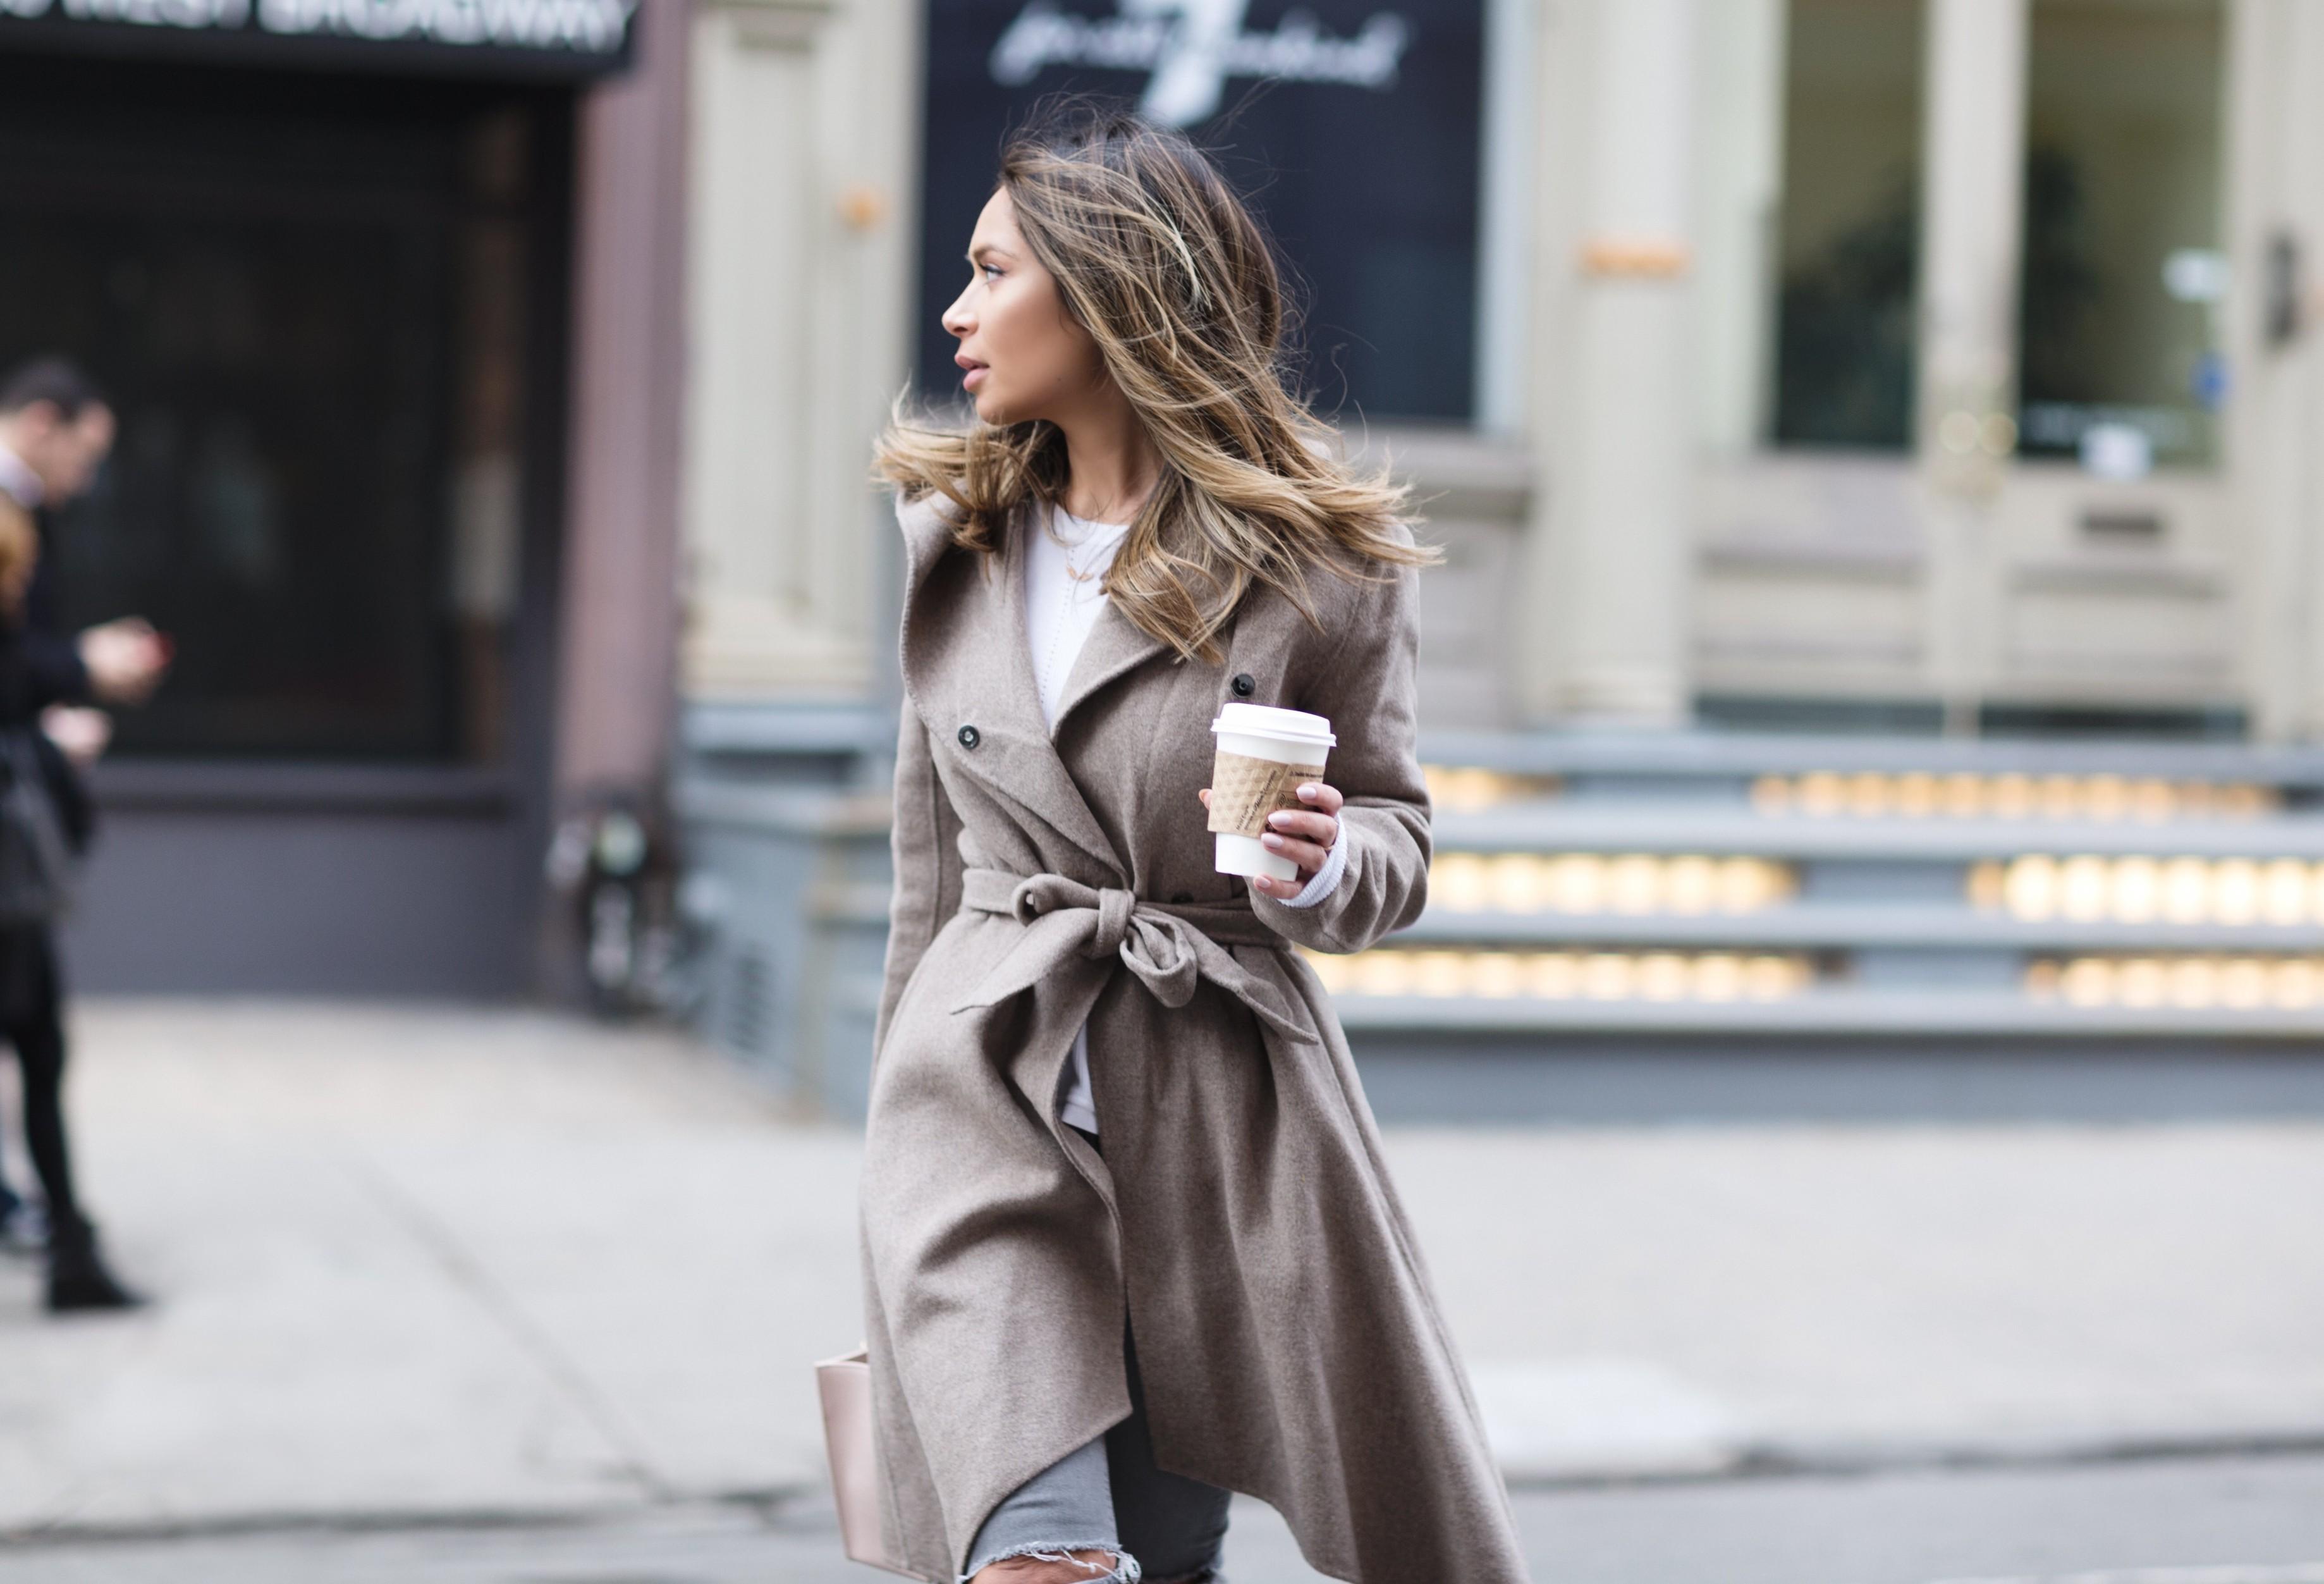 marianna hewitt hair nyc street style nyfw sac posen blogger